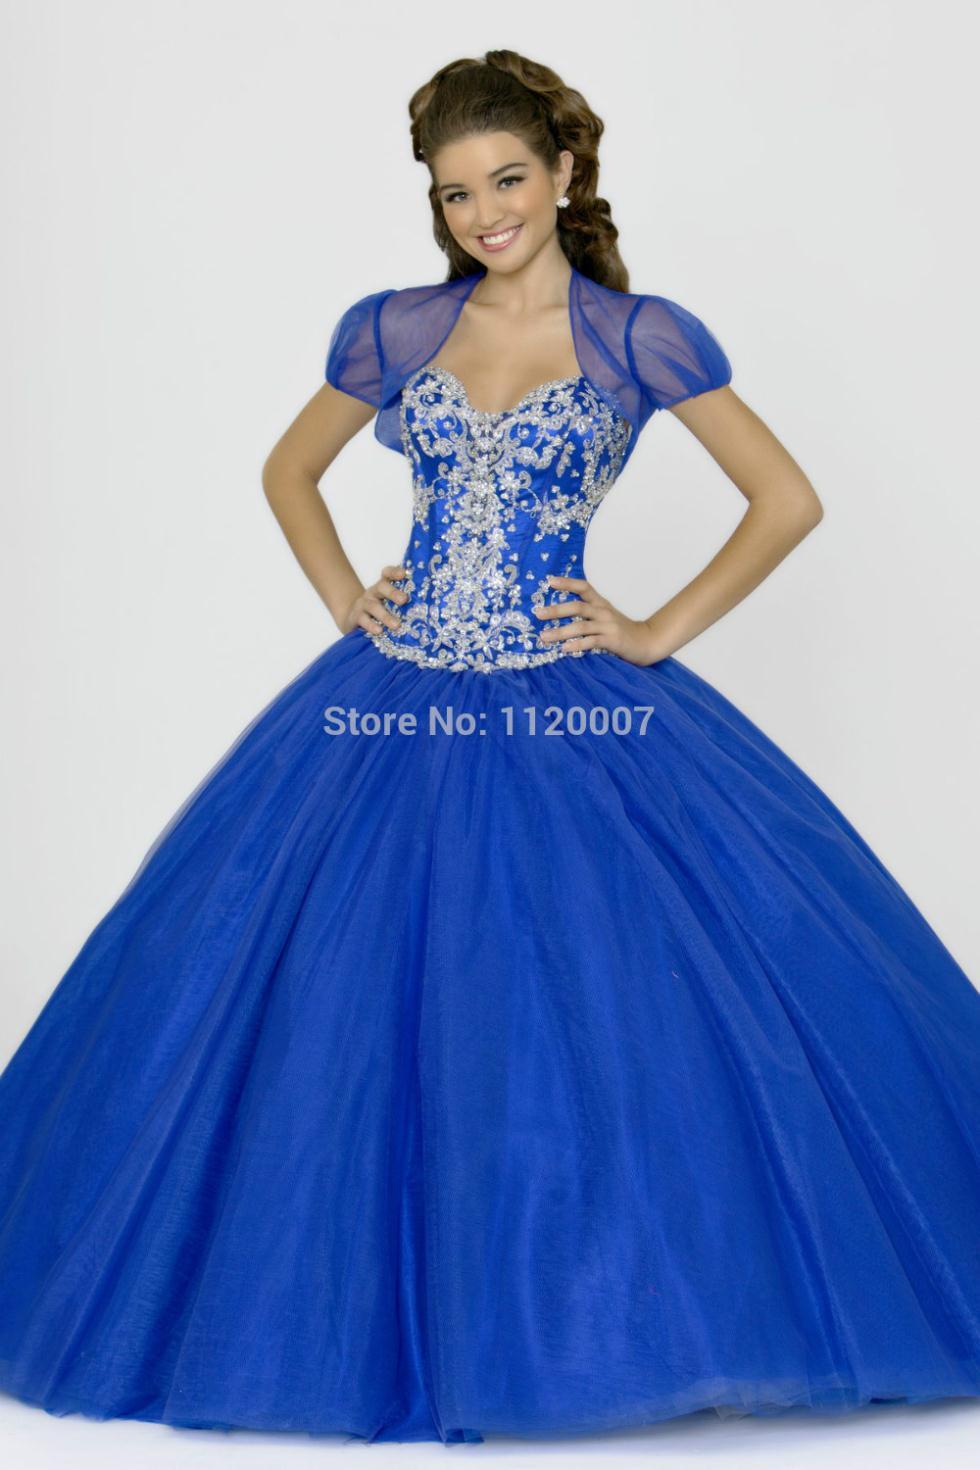 ... Dresses wit... Princess Wedding Dresses With Corset